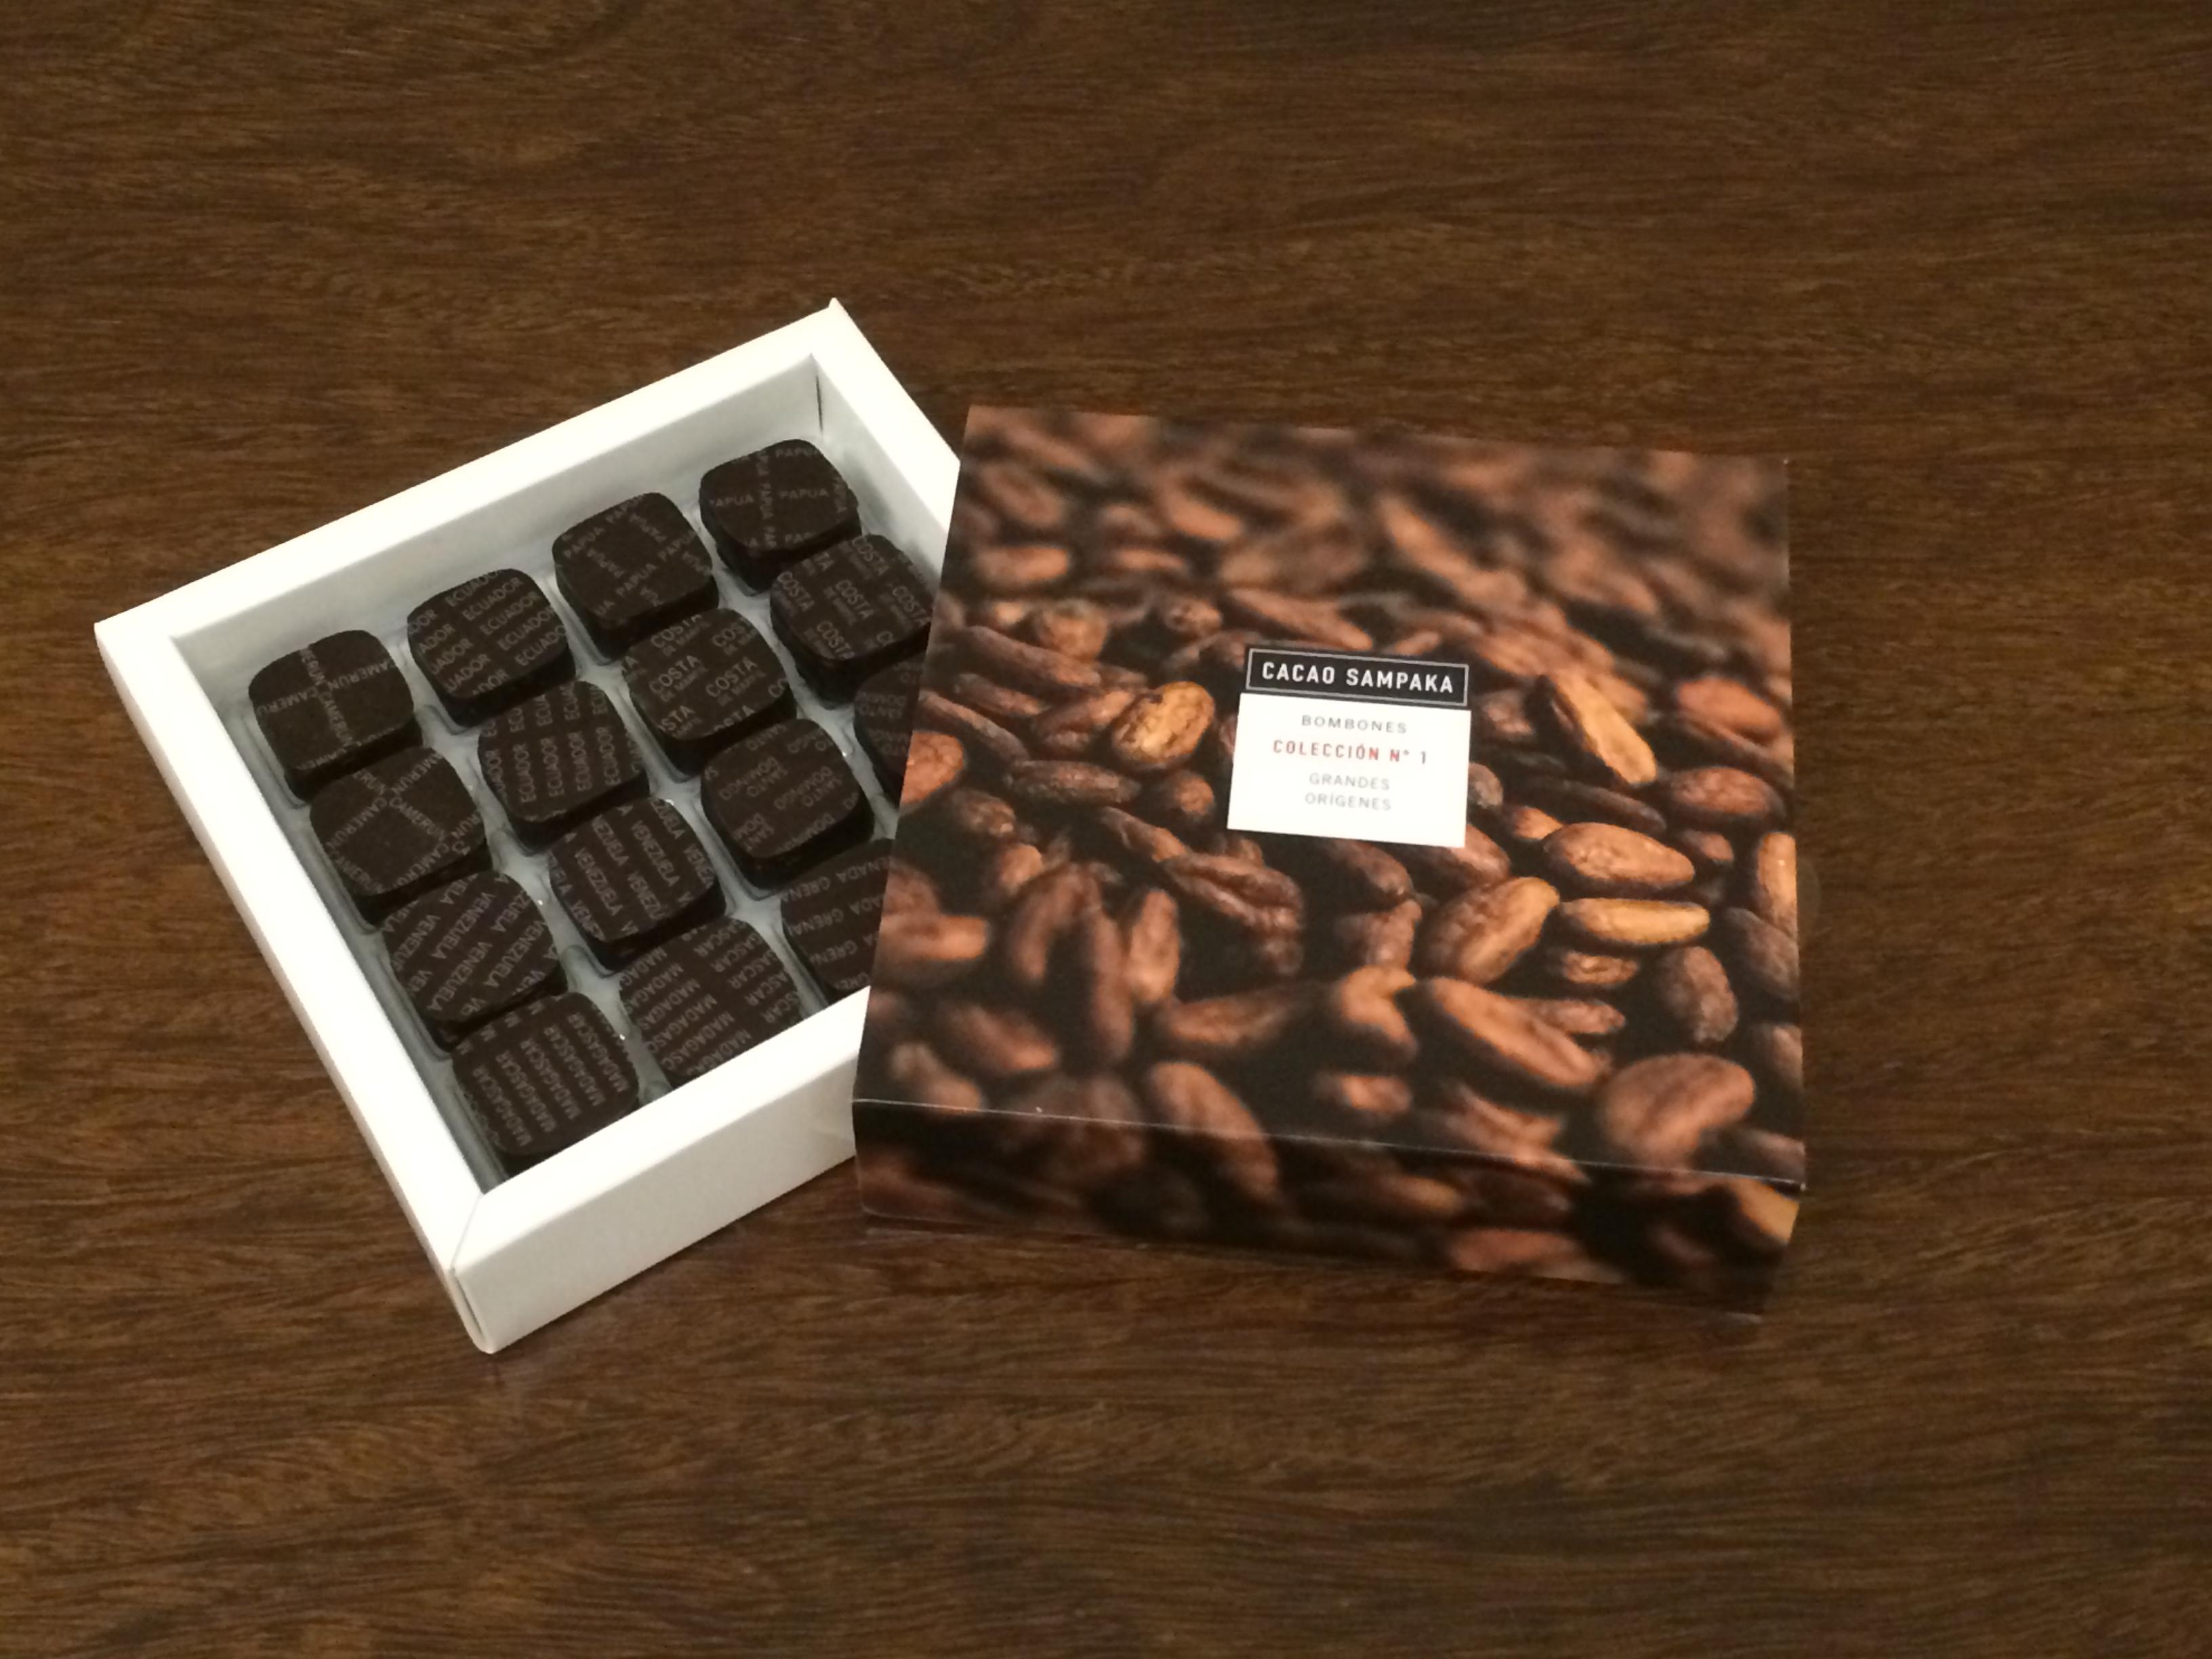 cacao sampaka chocolate espanhol no brasil choc243latras